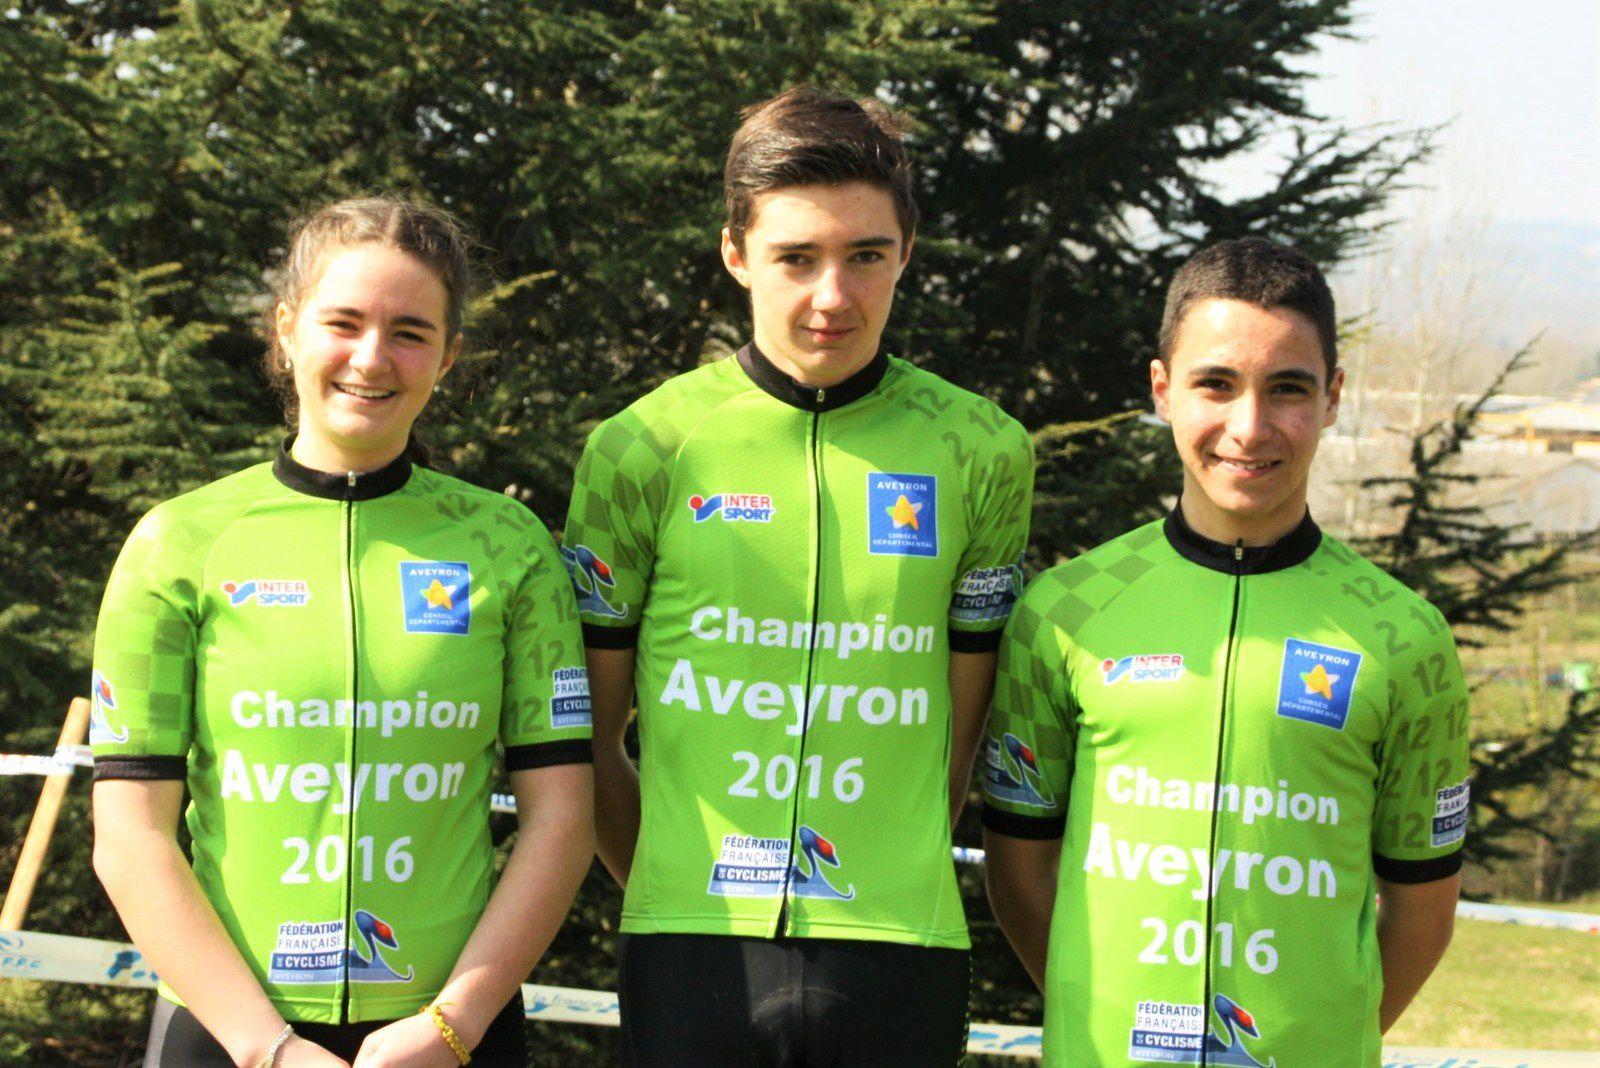 3 CHAMPIONS D'AVEYRON